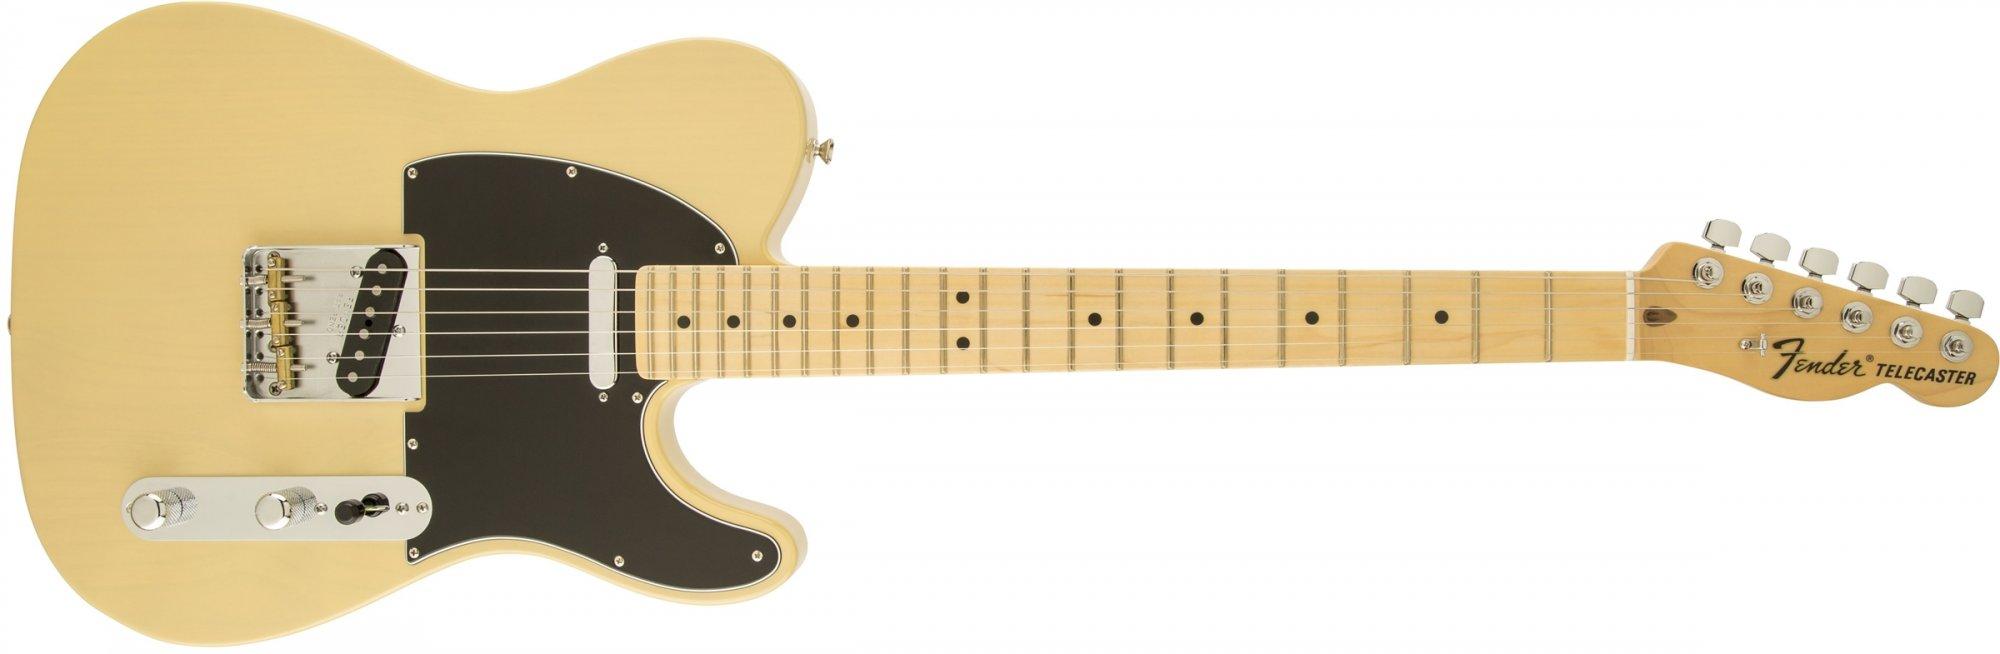 Fender American Special Telecaster Electric Guitar - Vintage Blonde